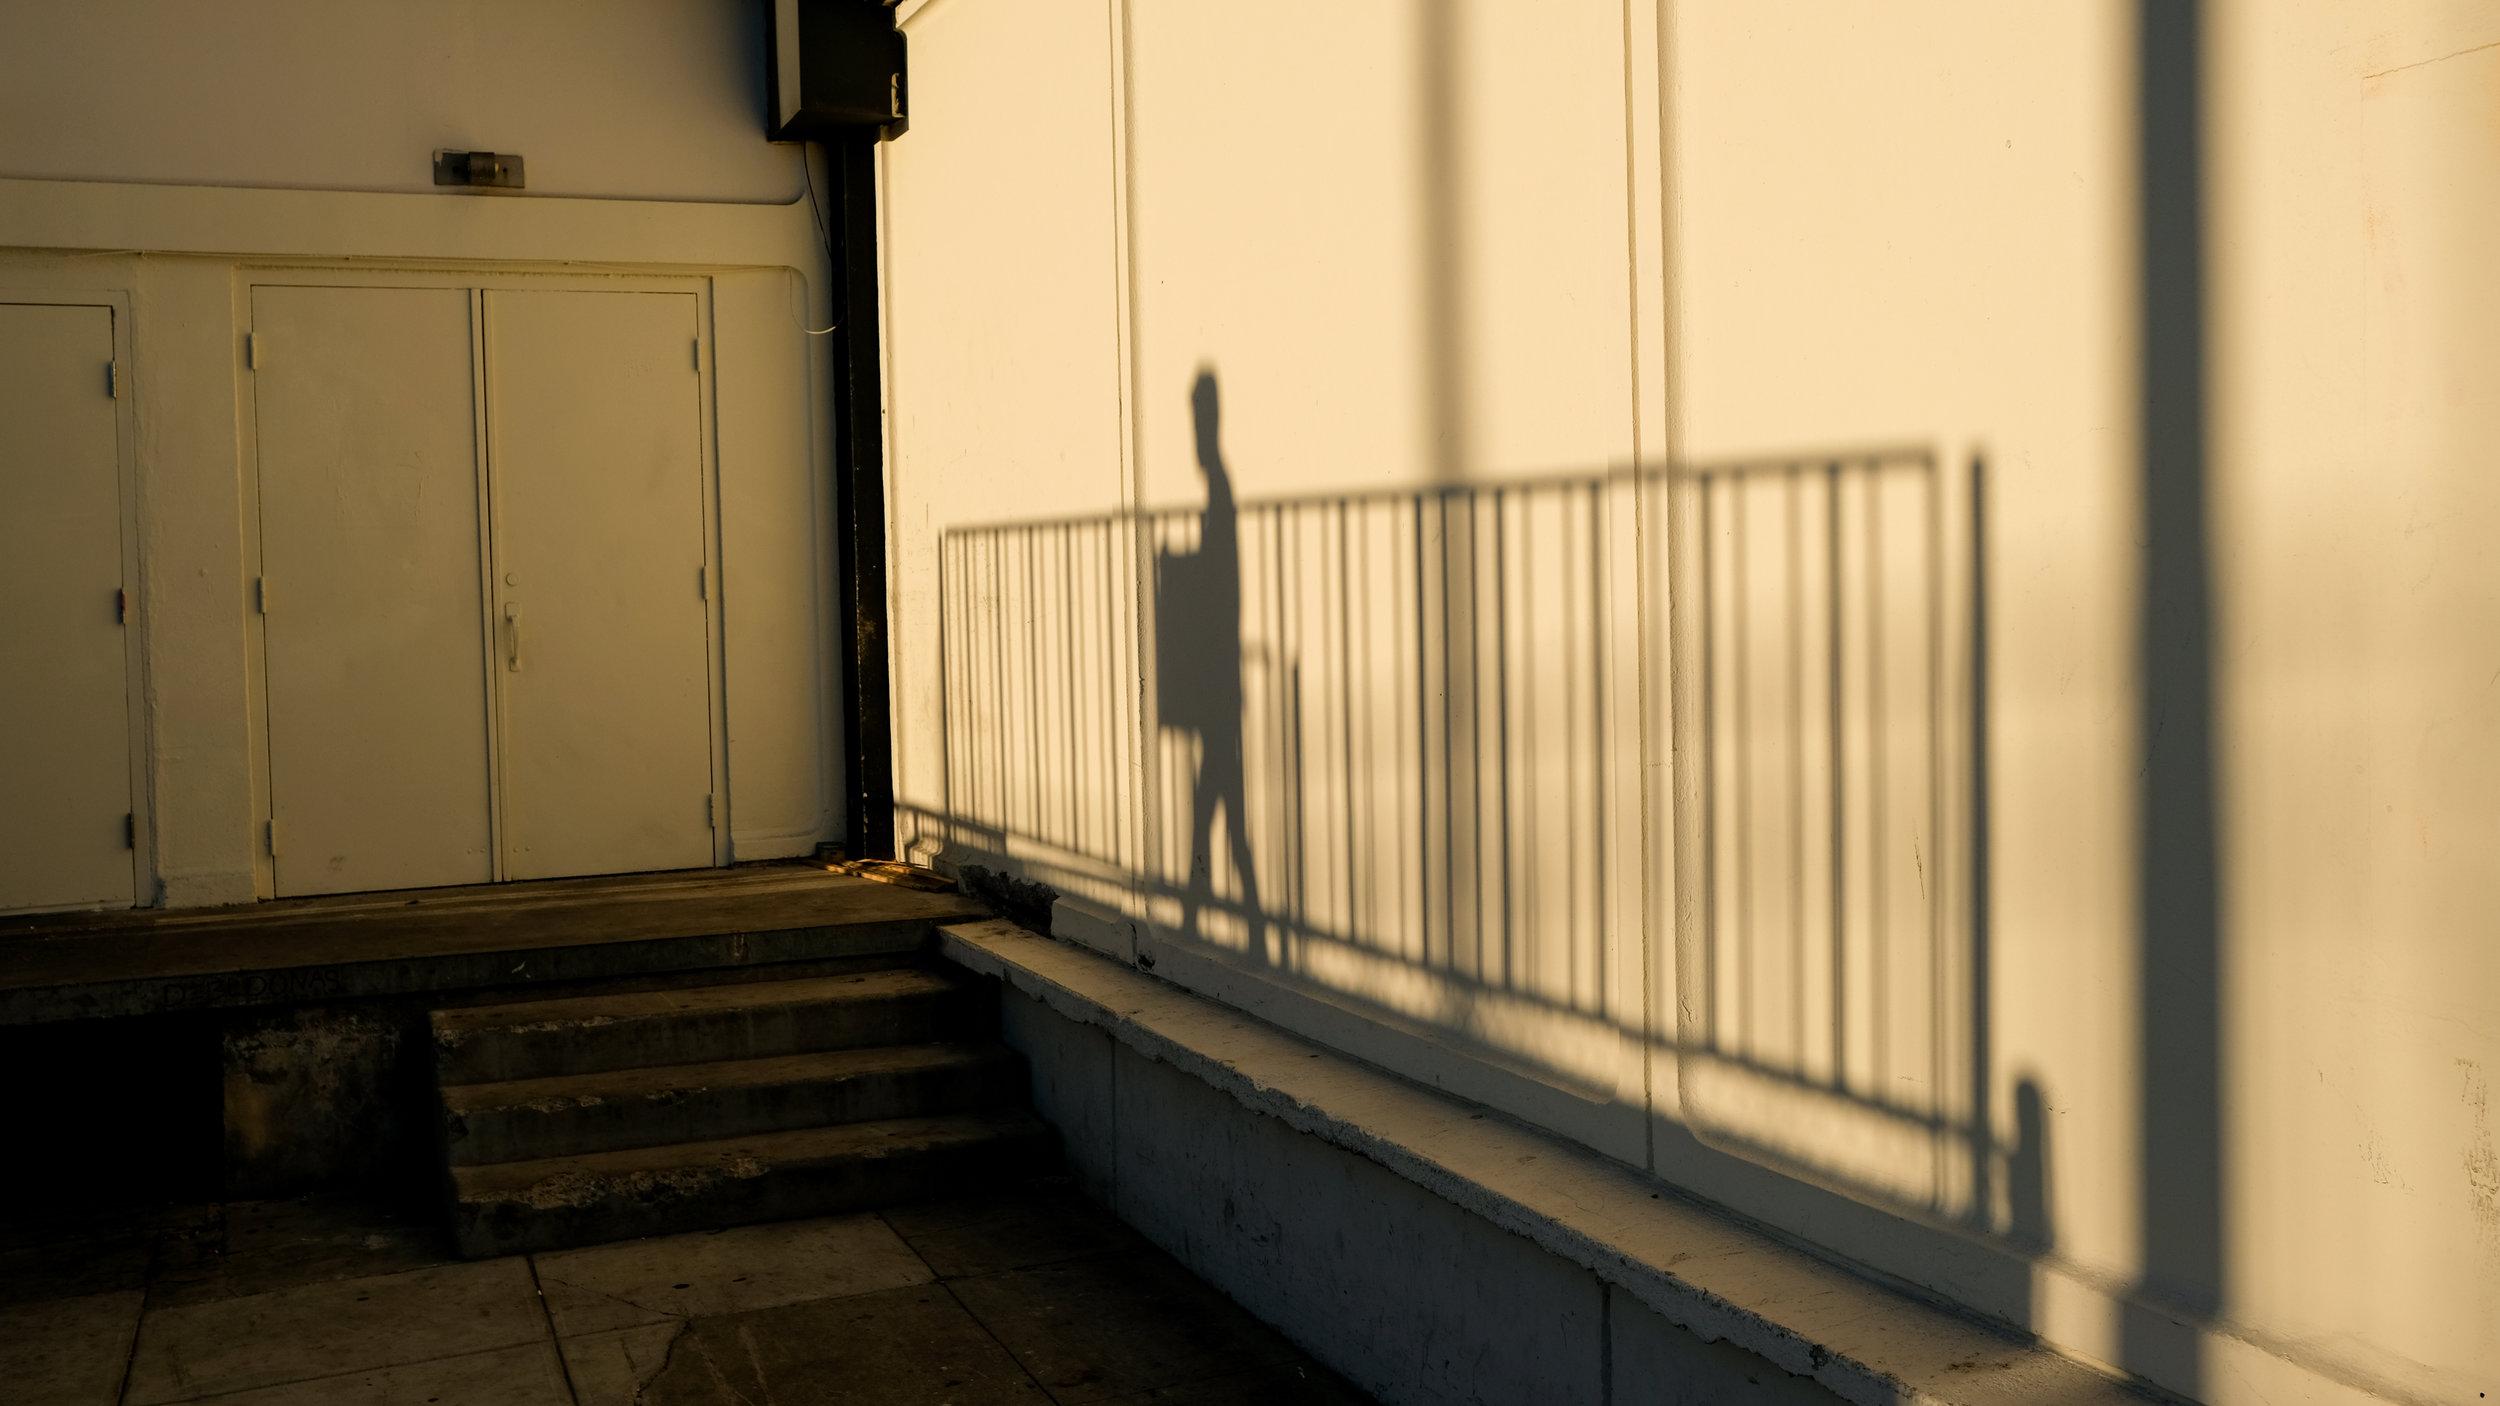 14_SAN-FRANCISCO_shadow.jpg